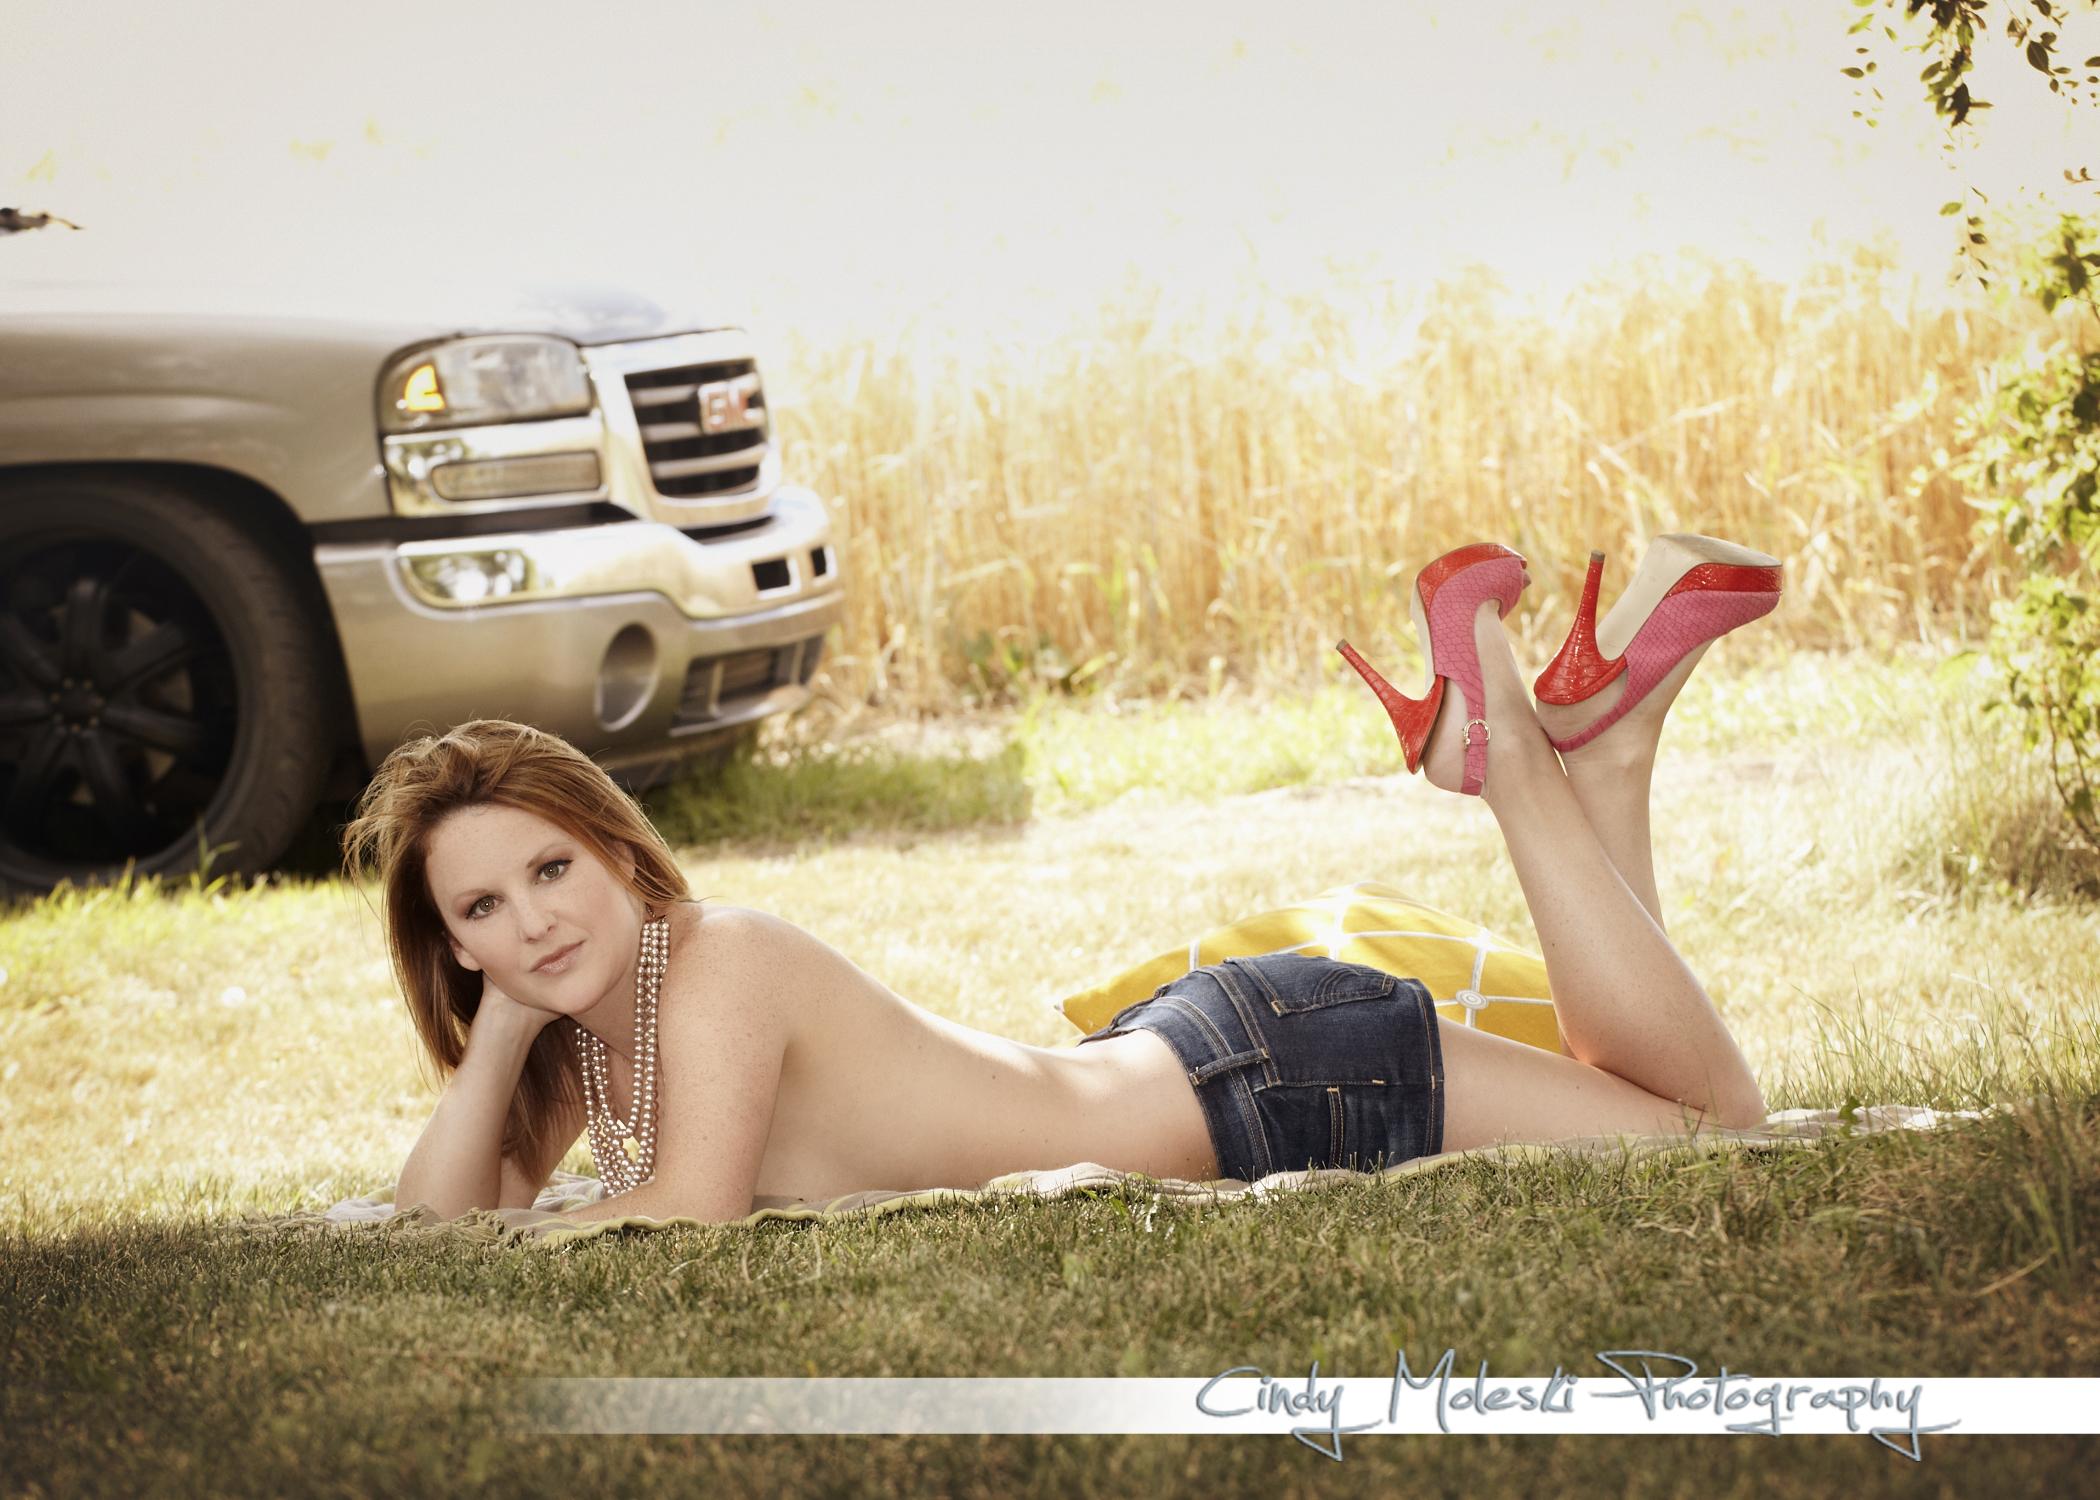 professional-boudoir-photographer-cindy-moleski-Pulver10C9727-blog).jpg